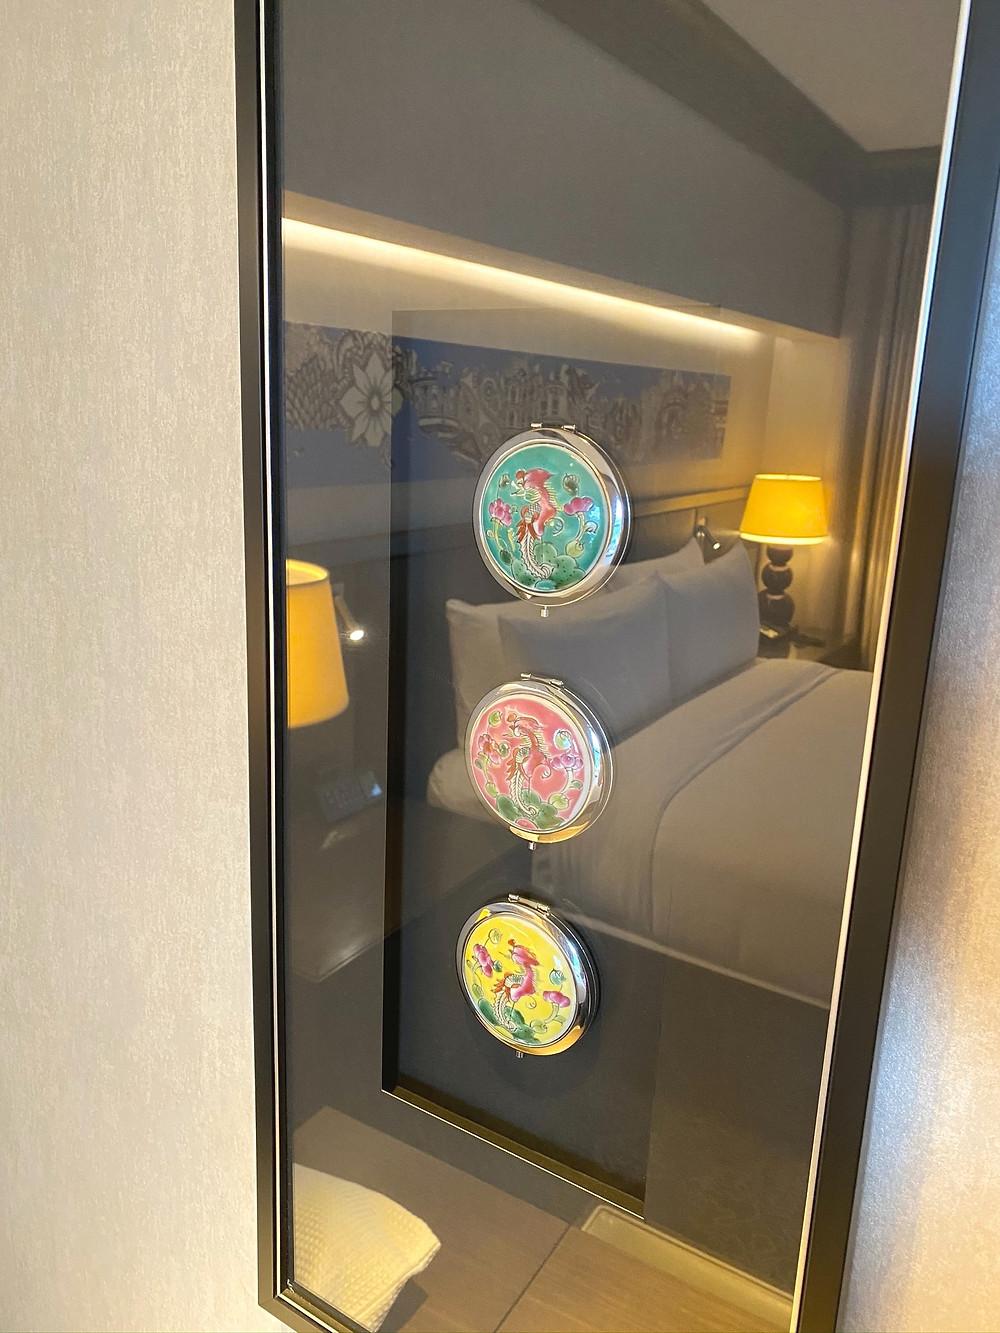 Fairmont Singapore Signature King Suite - Peranakan décor is visible at this suite